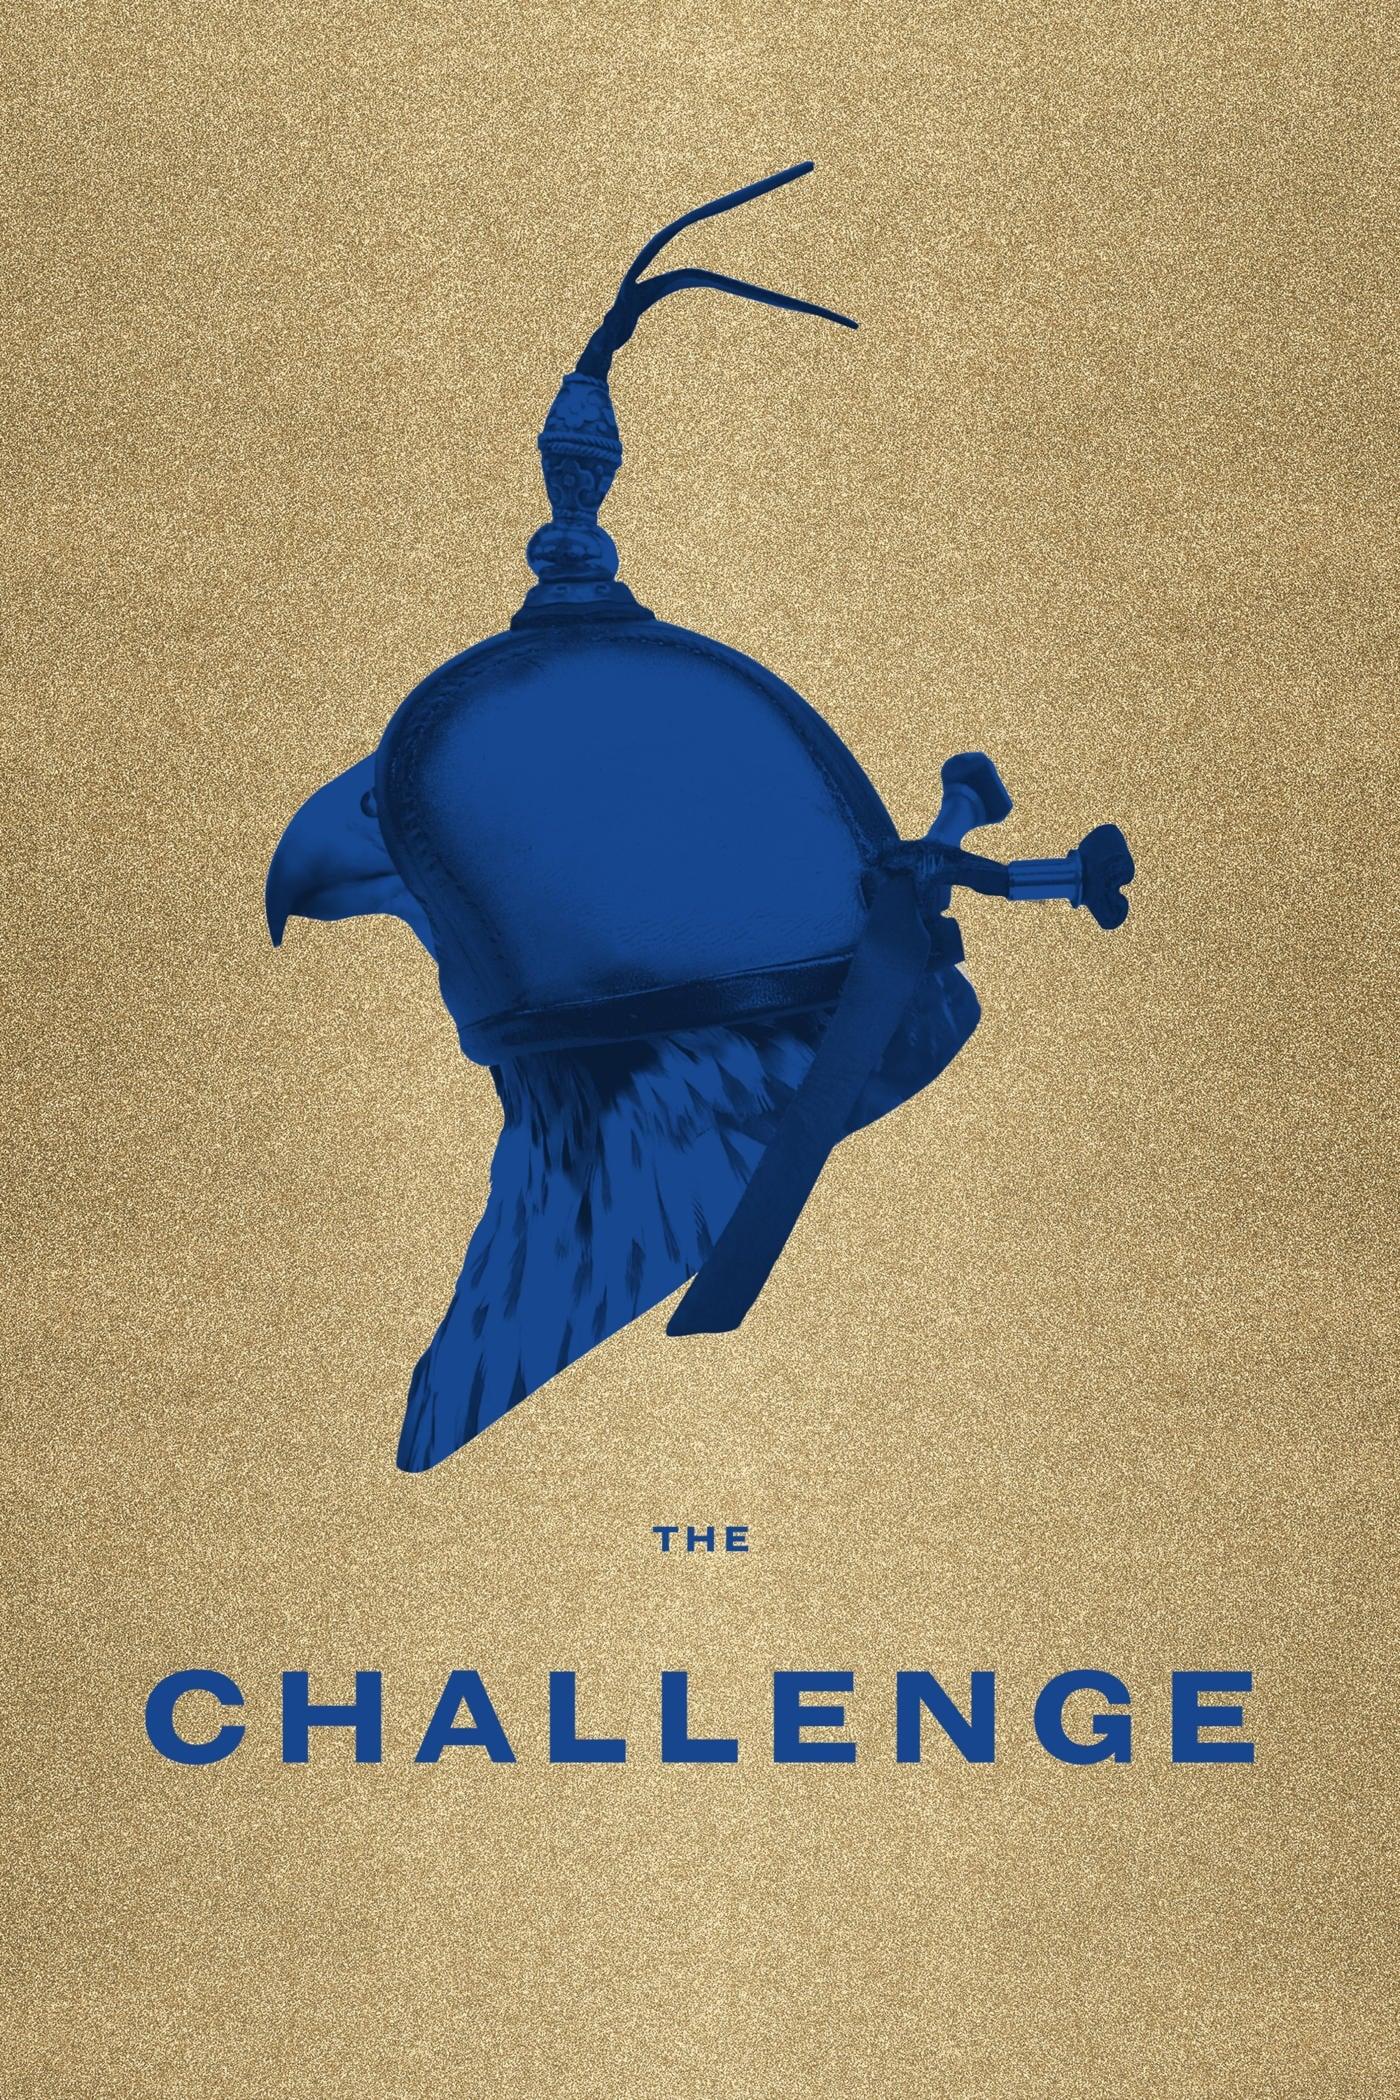 The Challenge (2016)